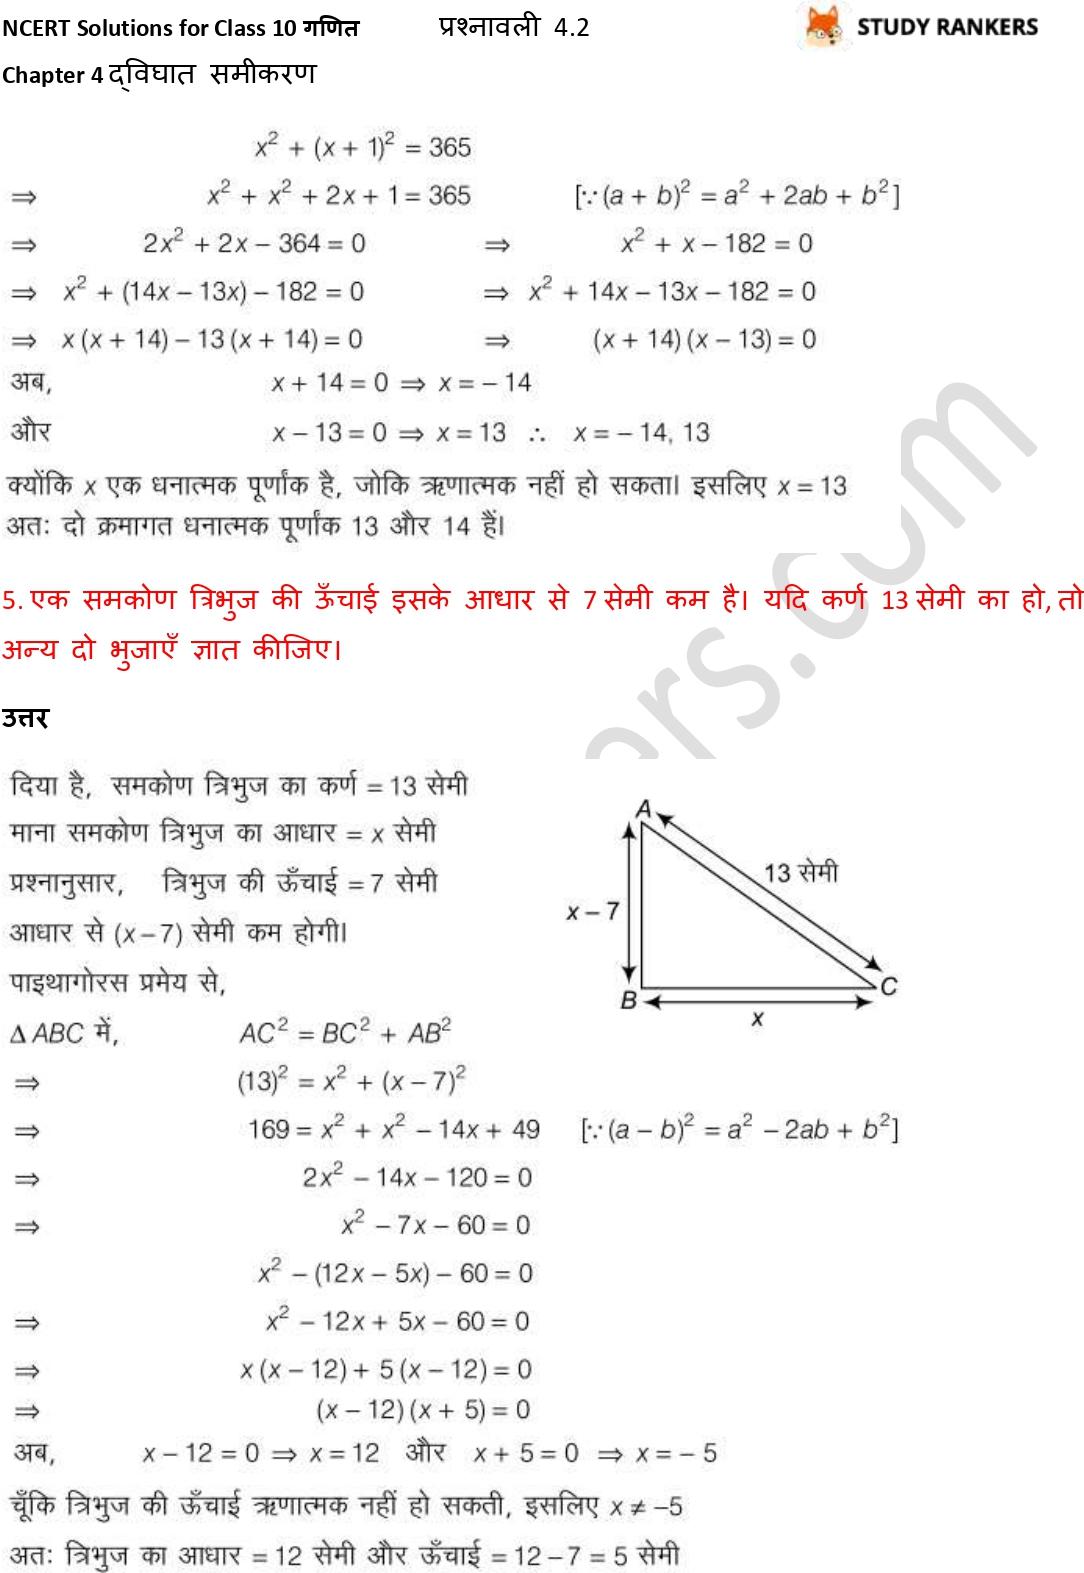 NCERT Solutions for Class 10 Maths Chapter 4 द्विघात समीकरण प्रश्नावली 4.2 Part 6